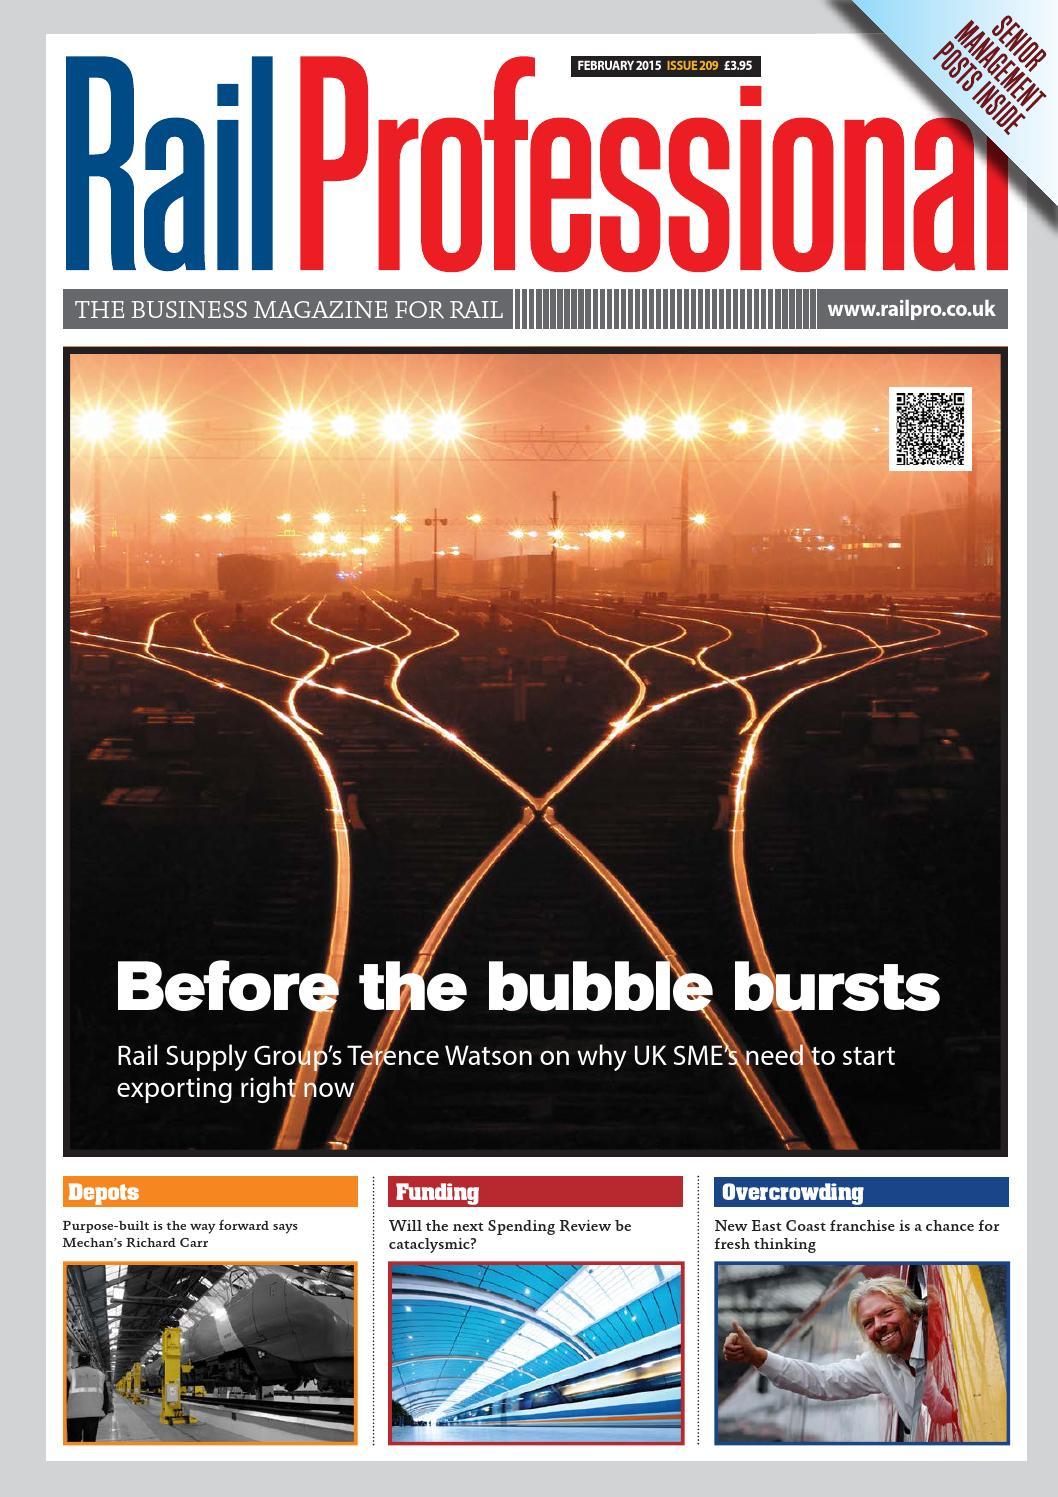 Rail Professional February 2015 Issue By Magazine Circuit Board Genuine Me Depot Issuu